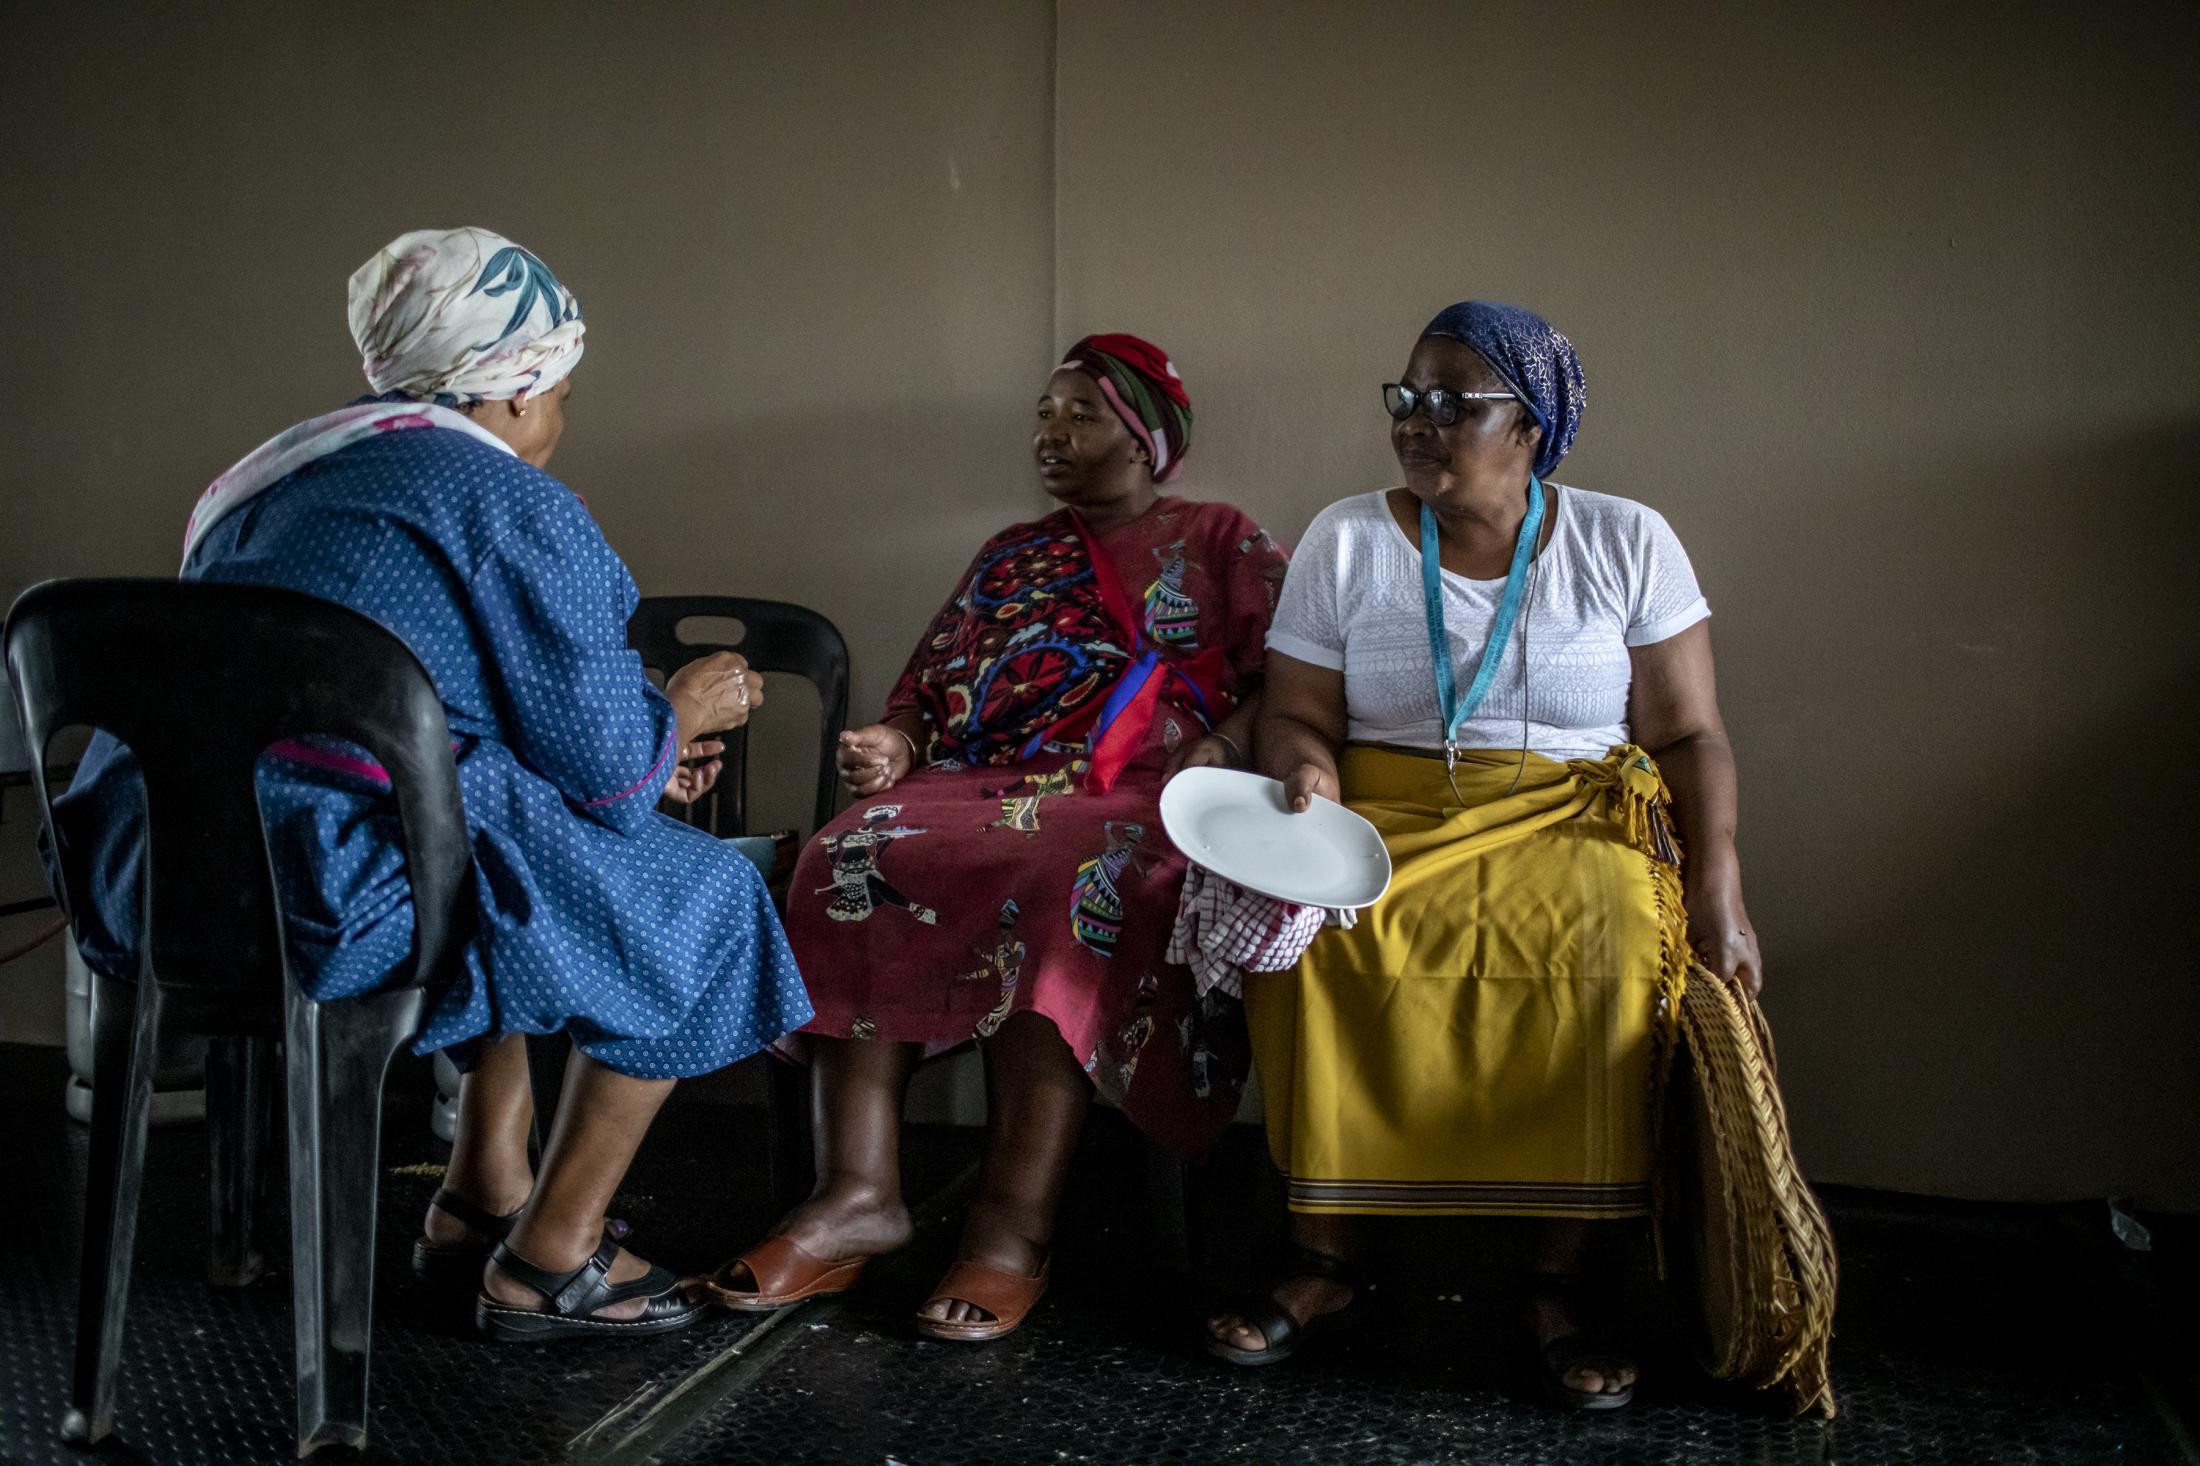 18 February 2020: Women are seated at the Shabalala household after the memorial service for Ladysmith Black Mambazo founder Joseph Shabalala in Ladysmith Kwa-Zulu Natal.